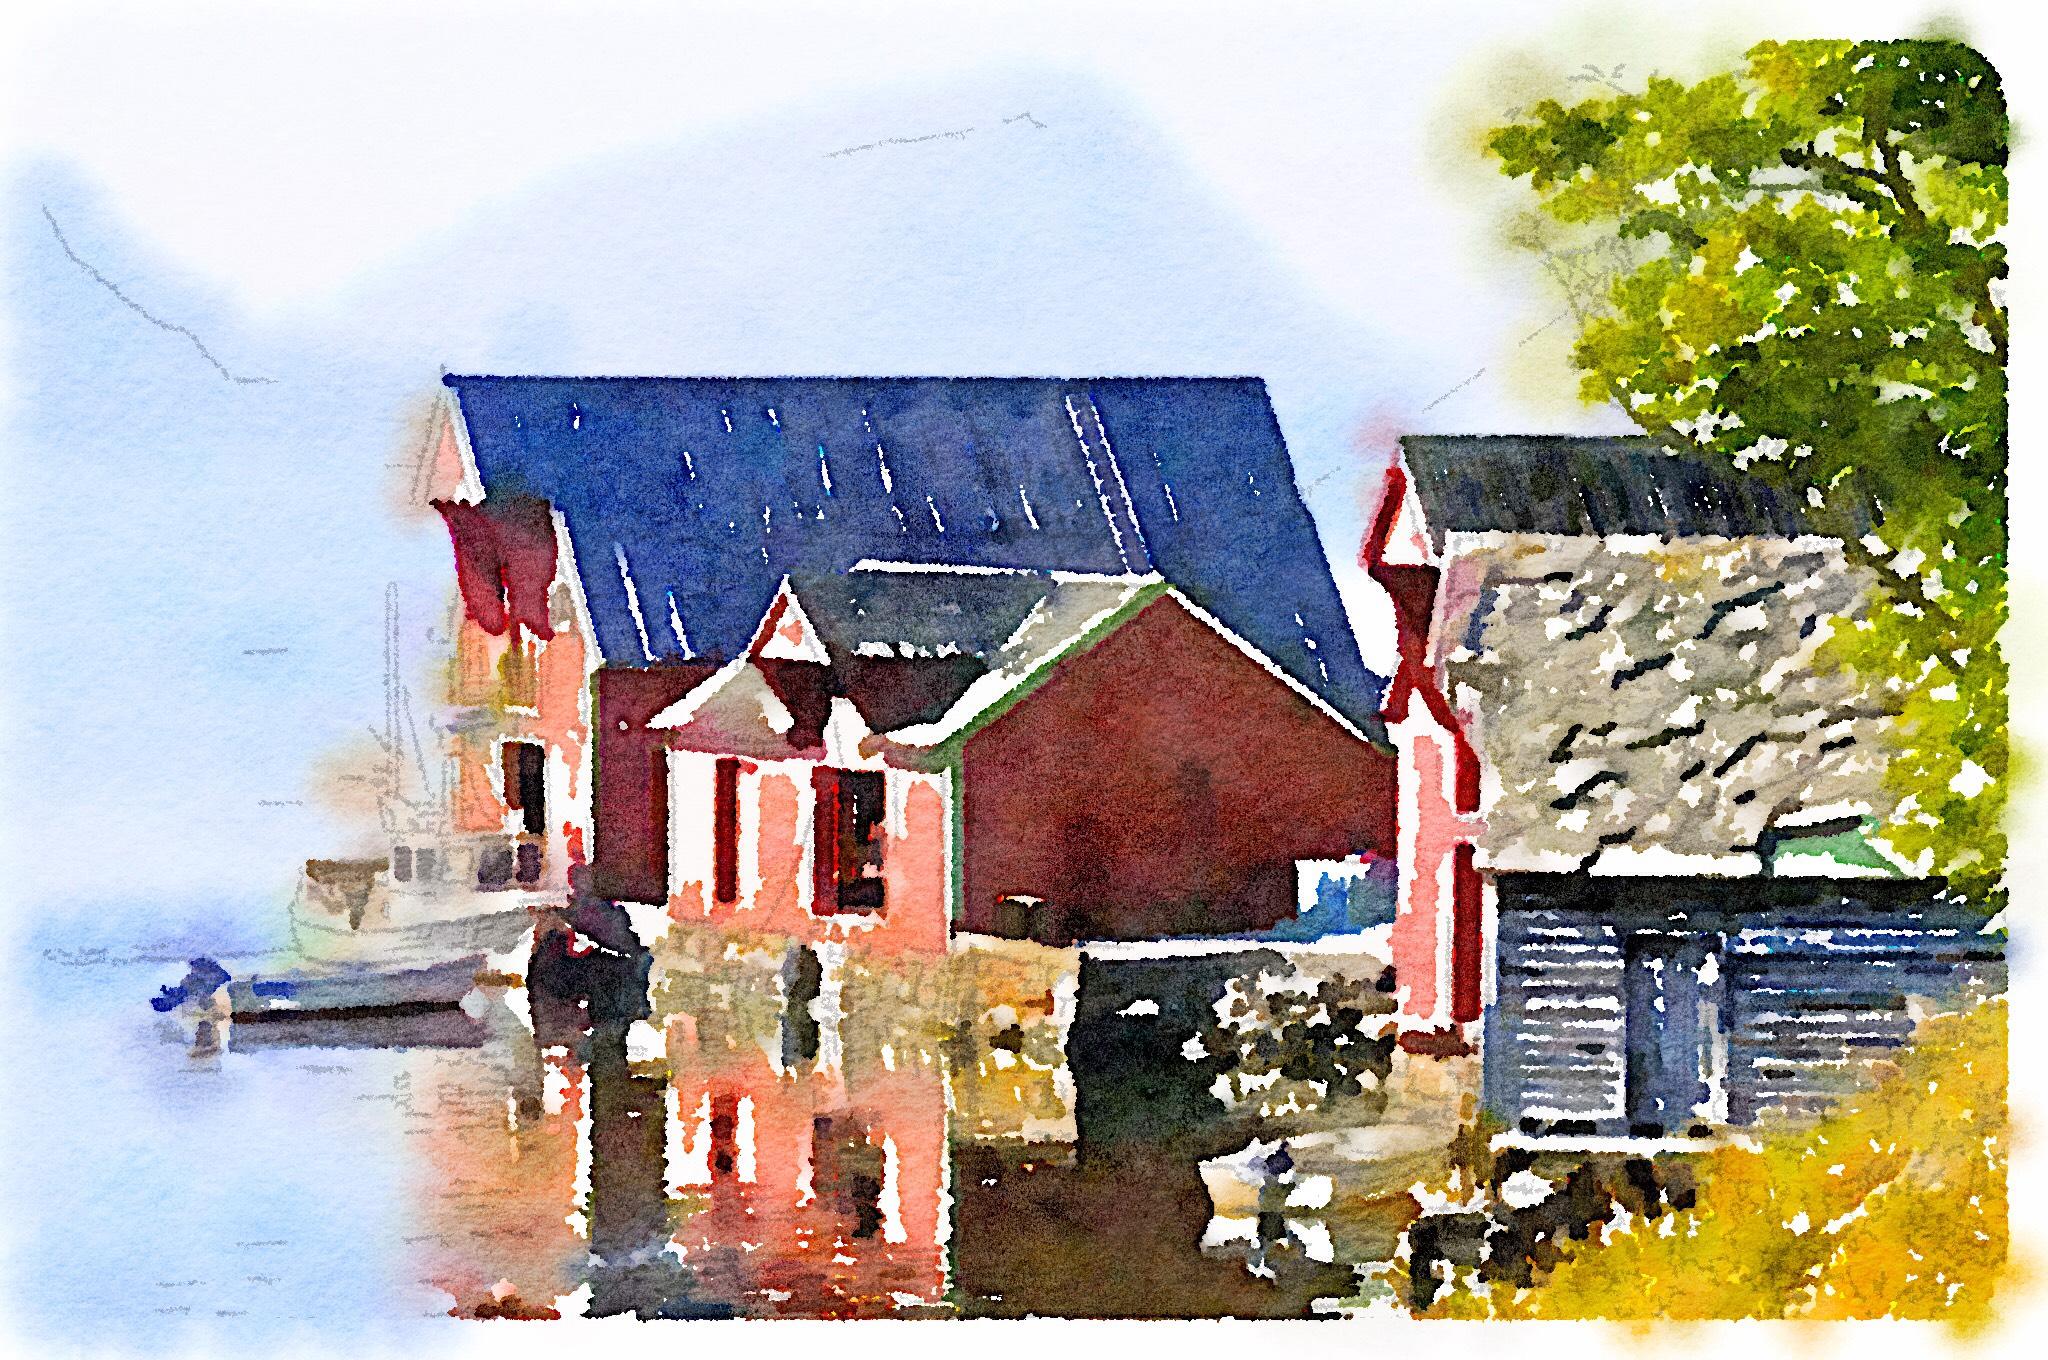 Edin Paintings - Magazine cover